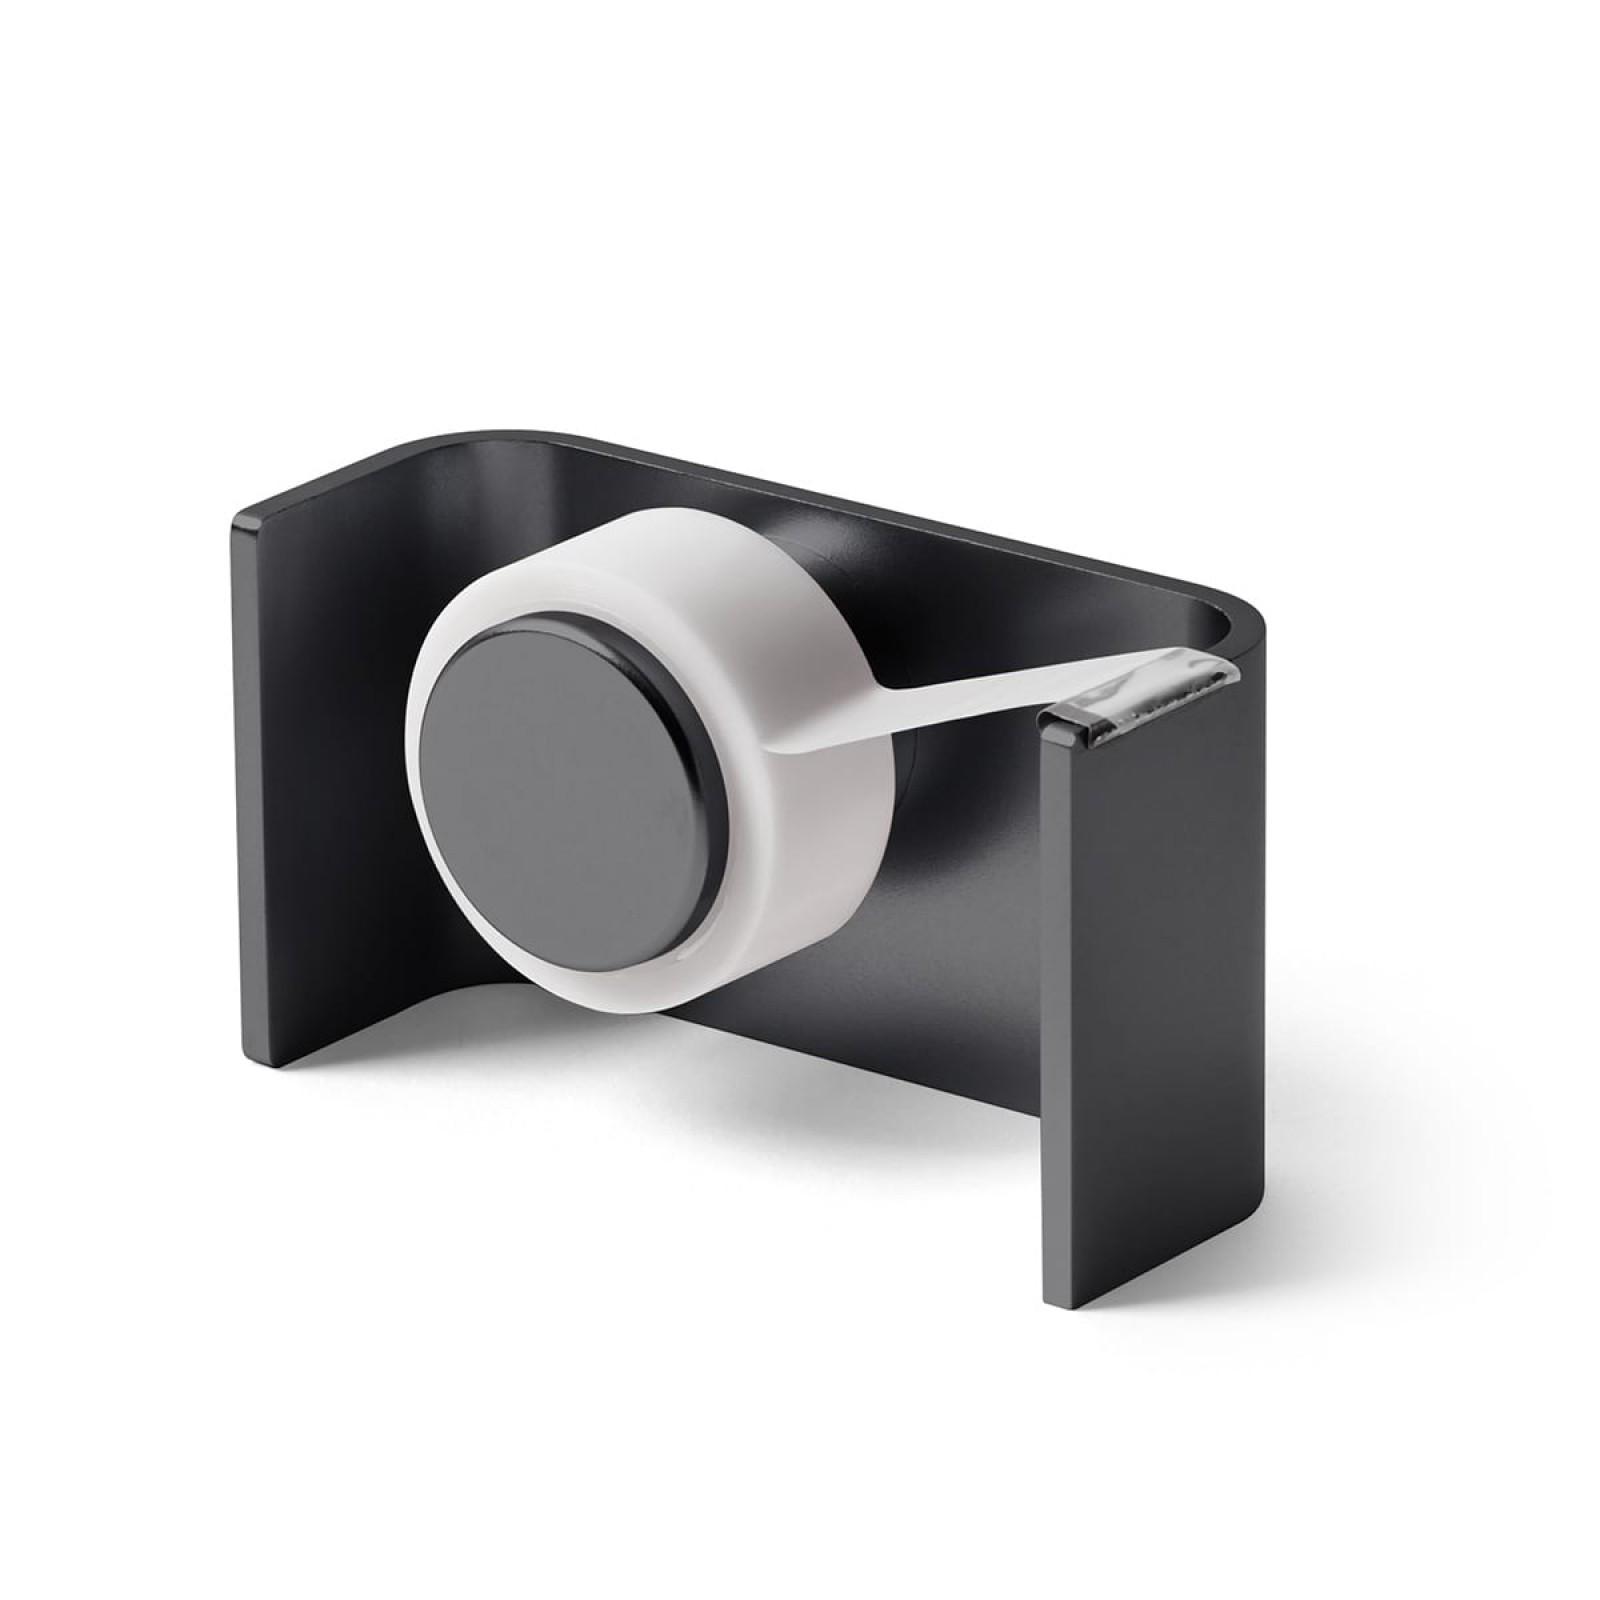 City Tape Dispenser (Metallic Grey) - LEXON